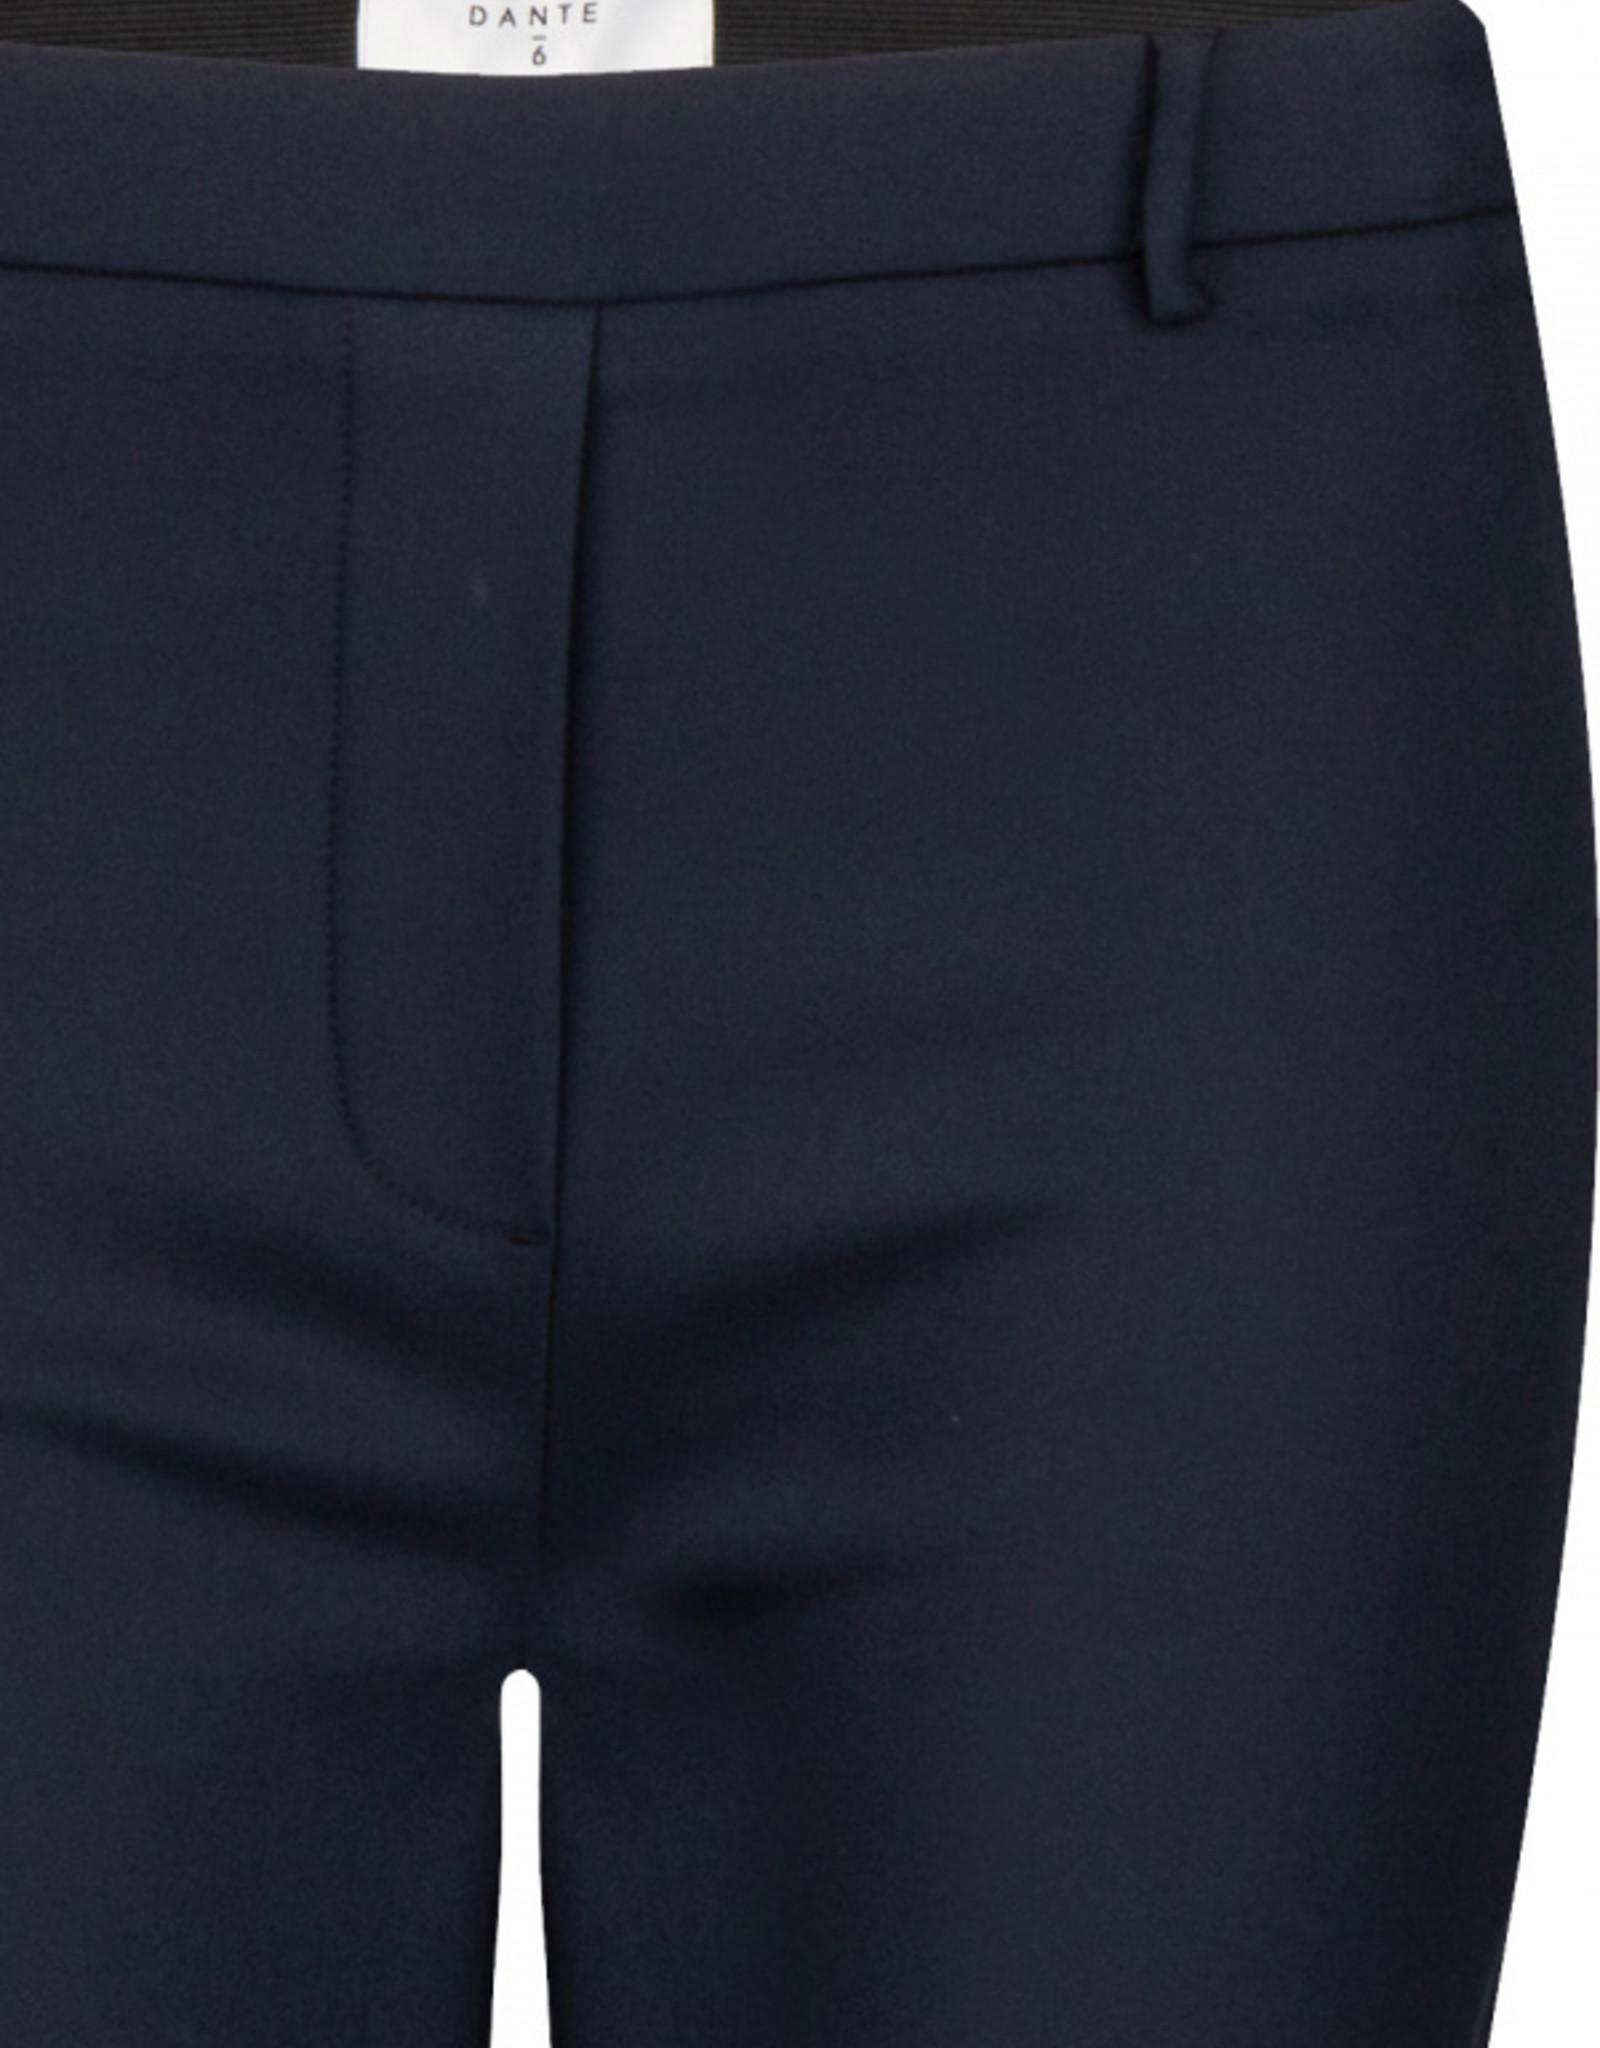 Dante 6 Slim Pants Midnight Blue